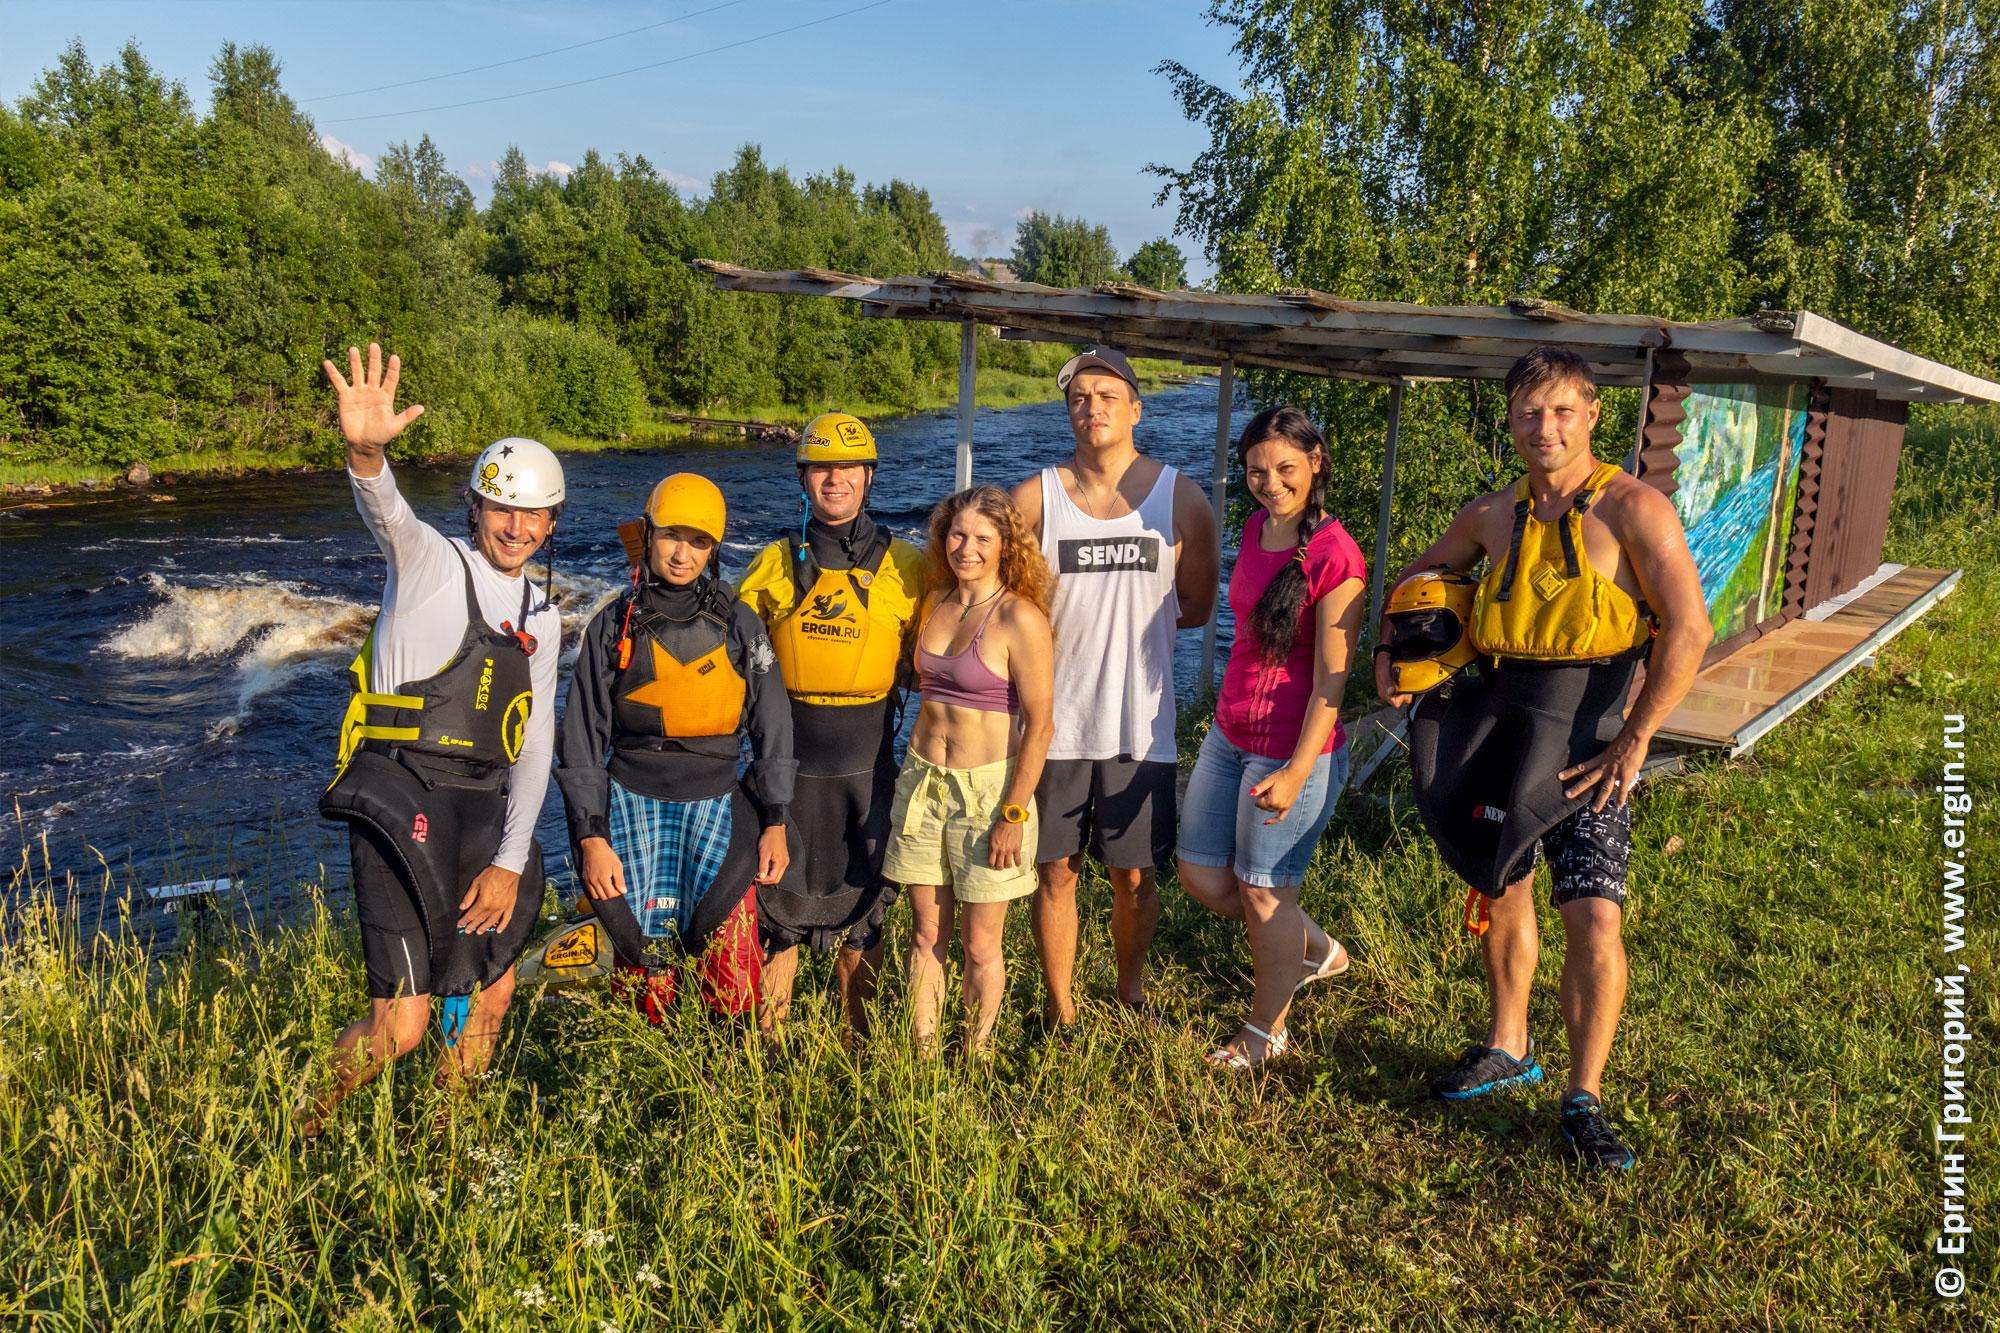 Участники 4-х сборов в Тивдии по фристайлу на бурной воде